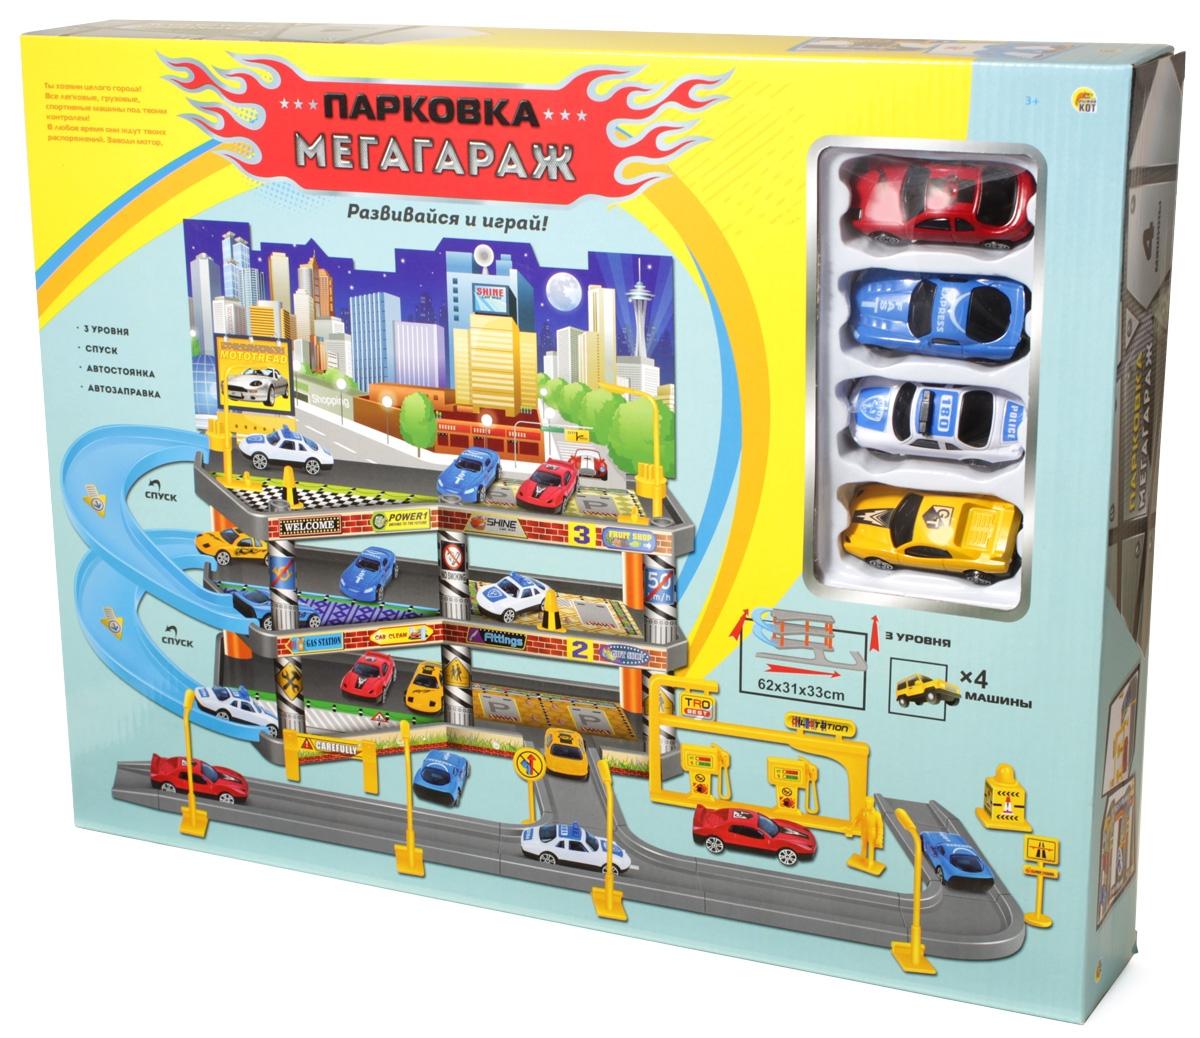 Рыжий Кот Парковка Мега Гараж с 4 машинами